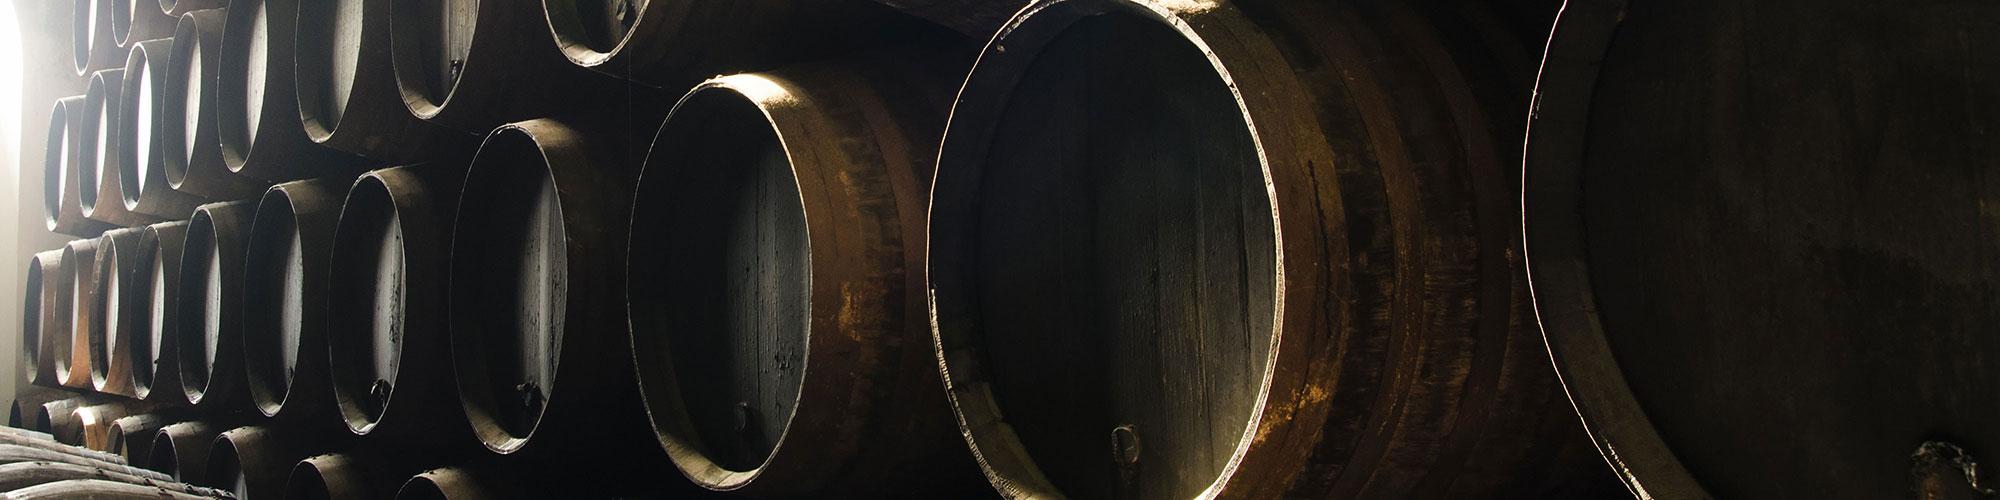 Scottish Whisky Wooden Barrels in Scotland